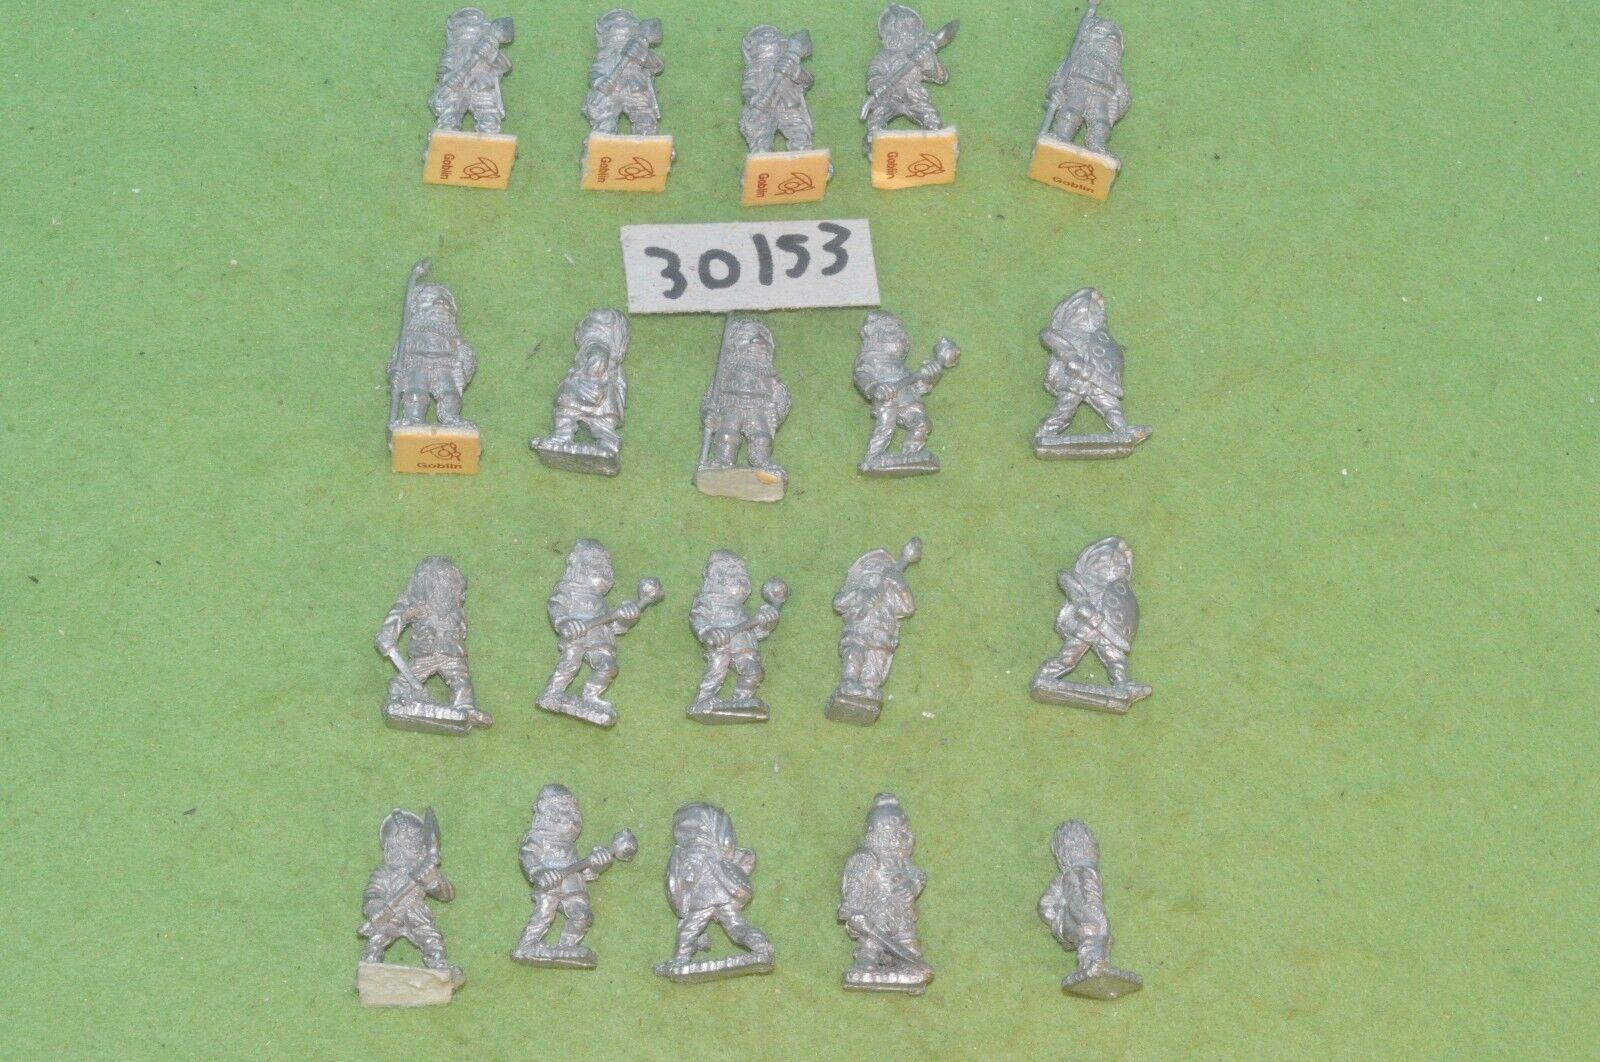 Dwarf warriors 20 metal sigmar order fantasy (30153) warhammer